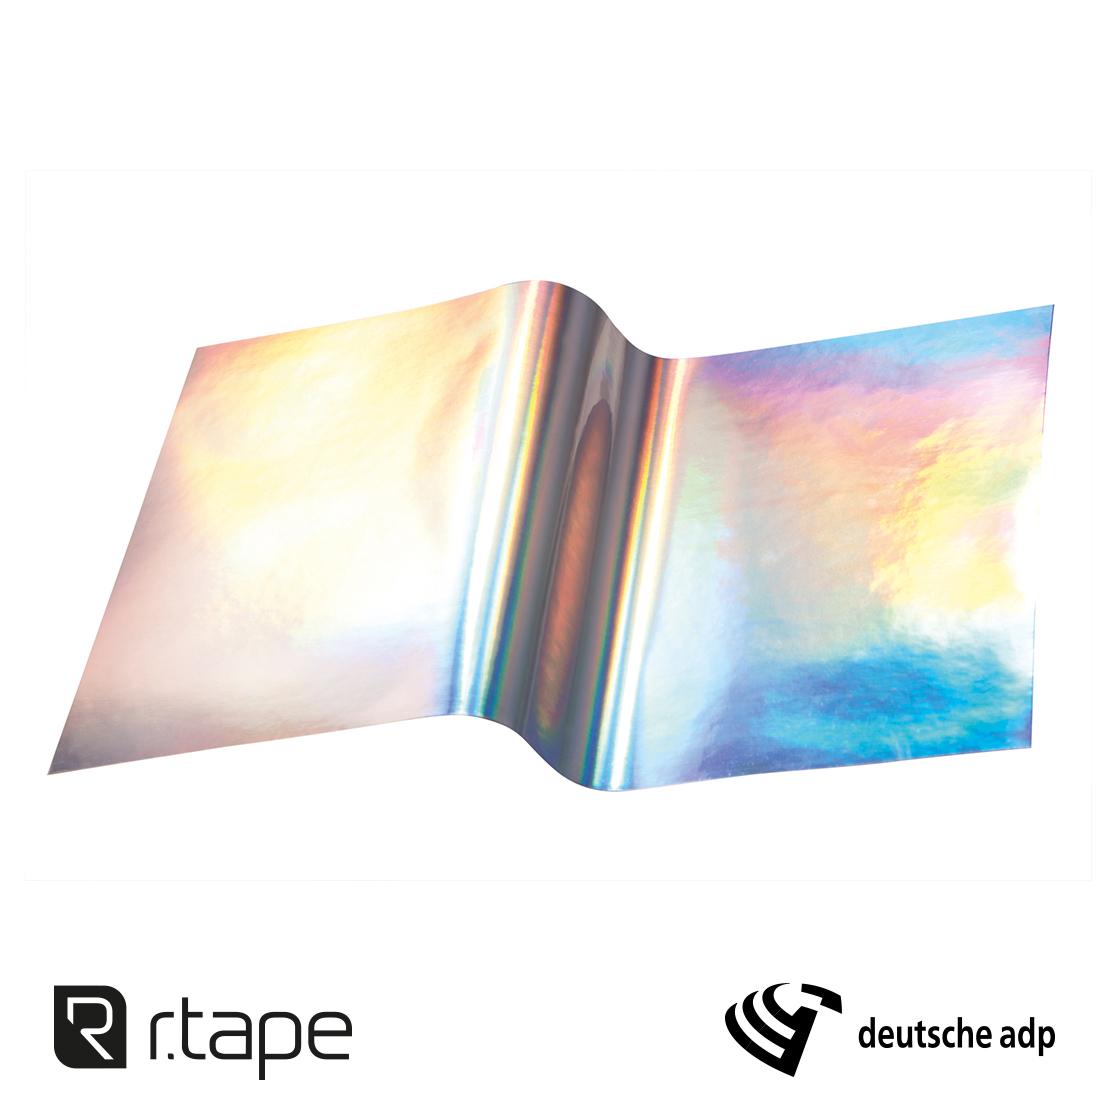 RTape VinylEfx - Outdoor Durable